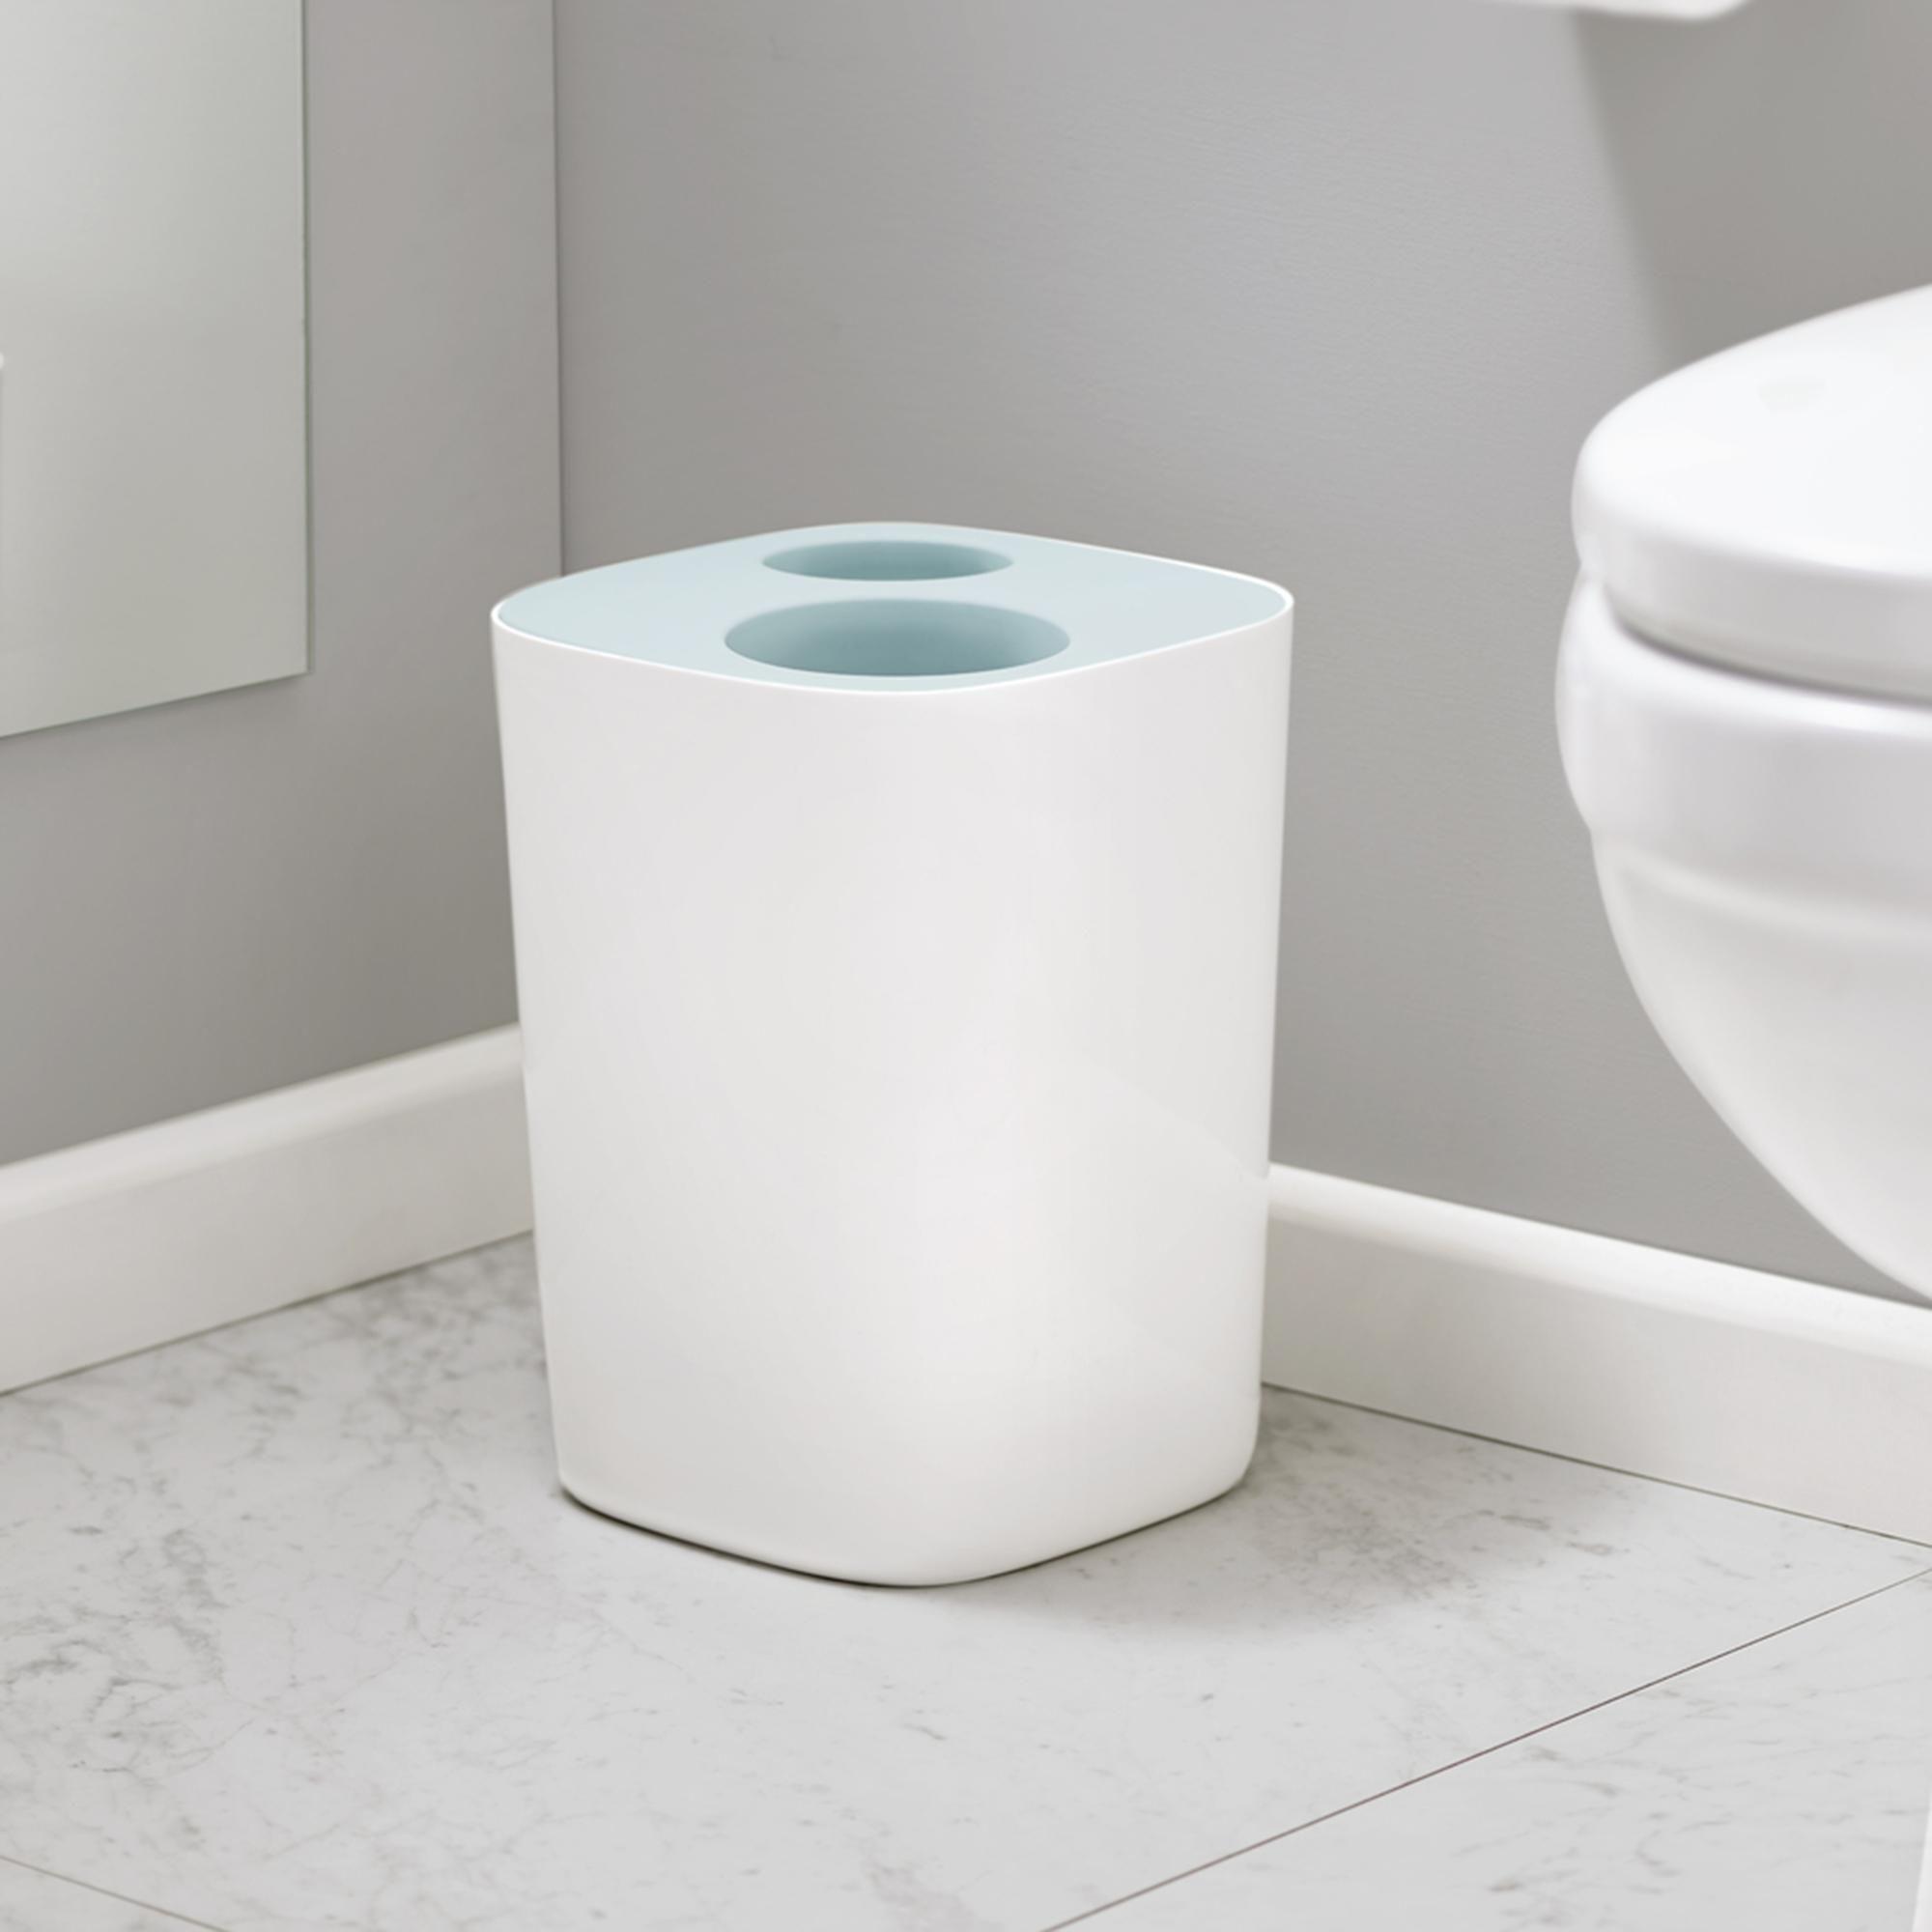 Joseph Joseph Split Bathroom Waste Separation Bin In 2020 Bathroom Bin Joseph Joseph Joseph Joseph Bin